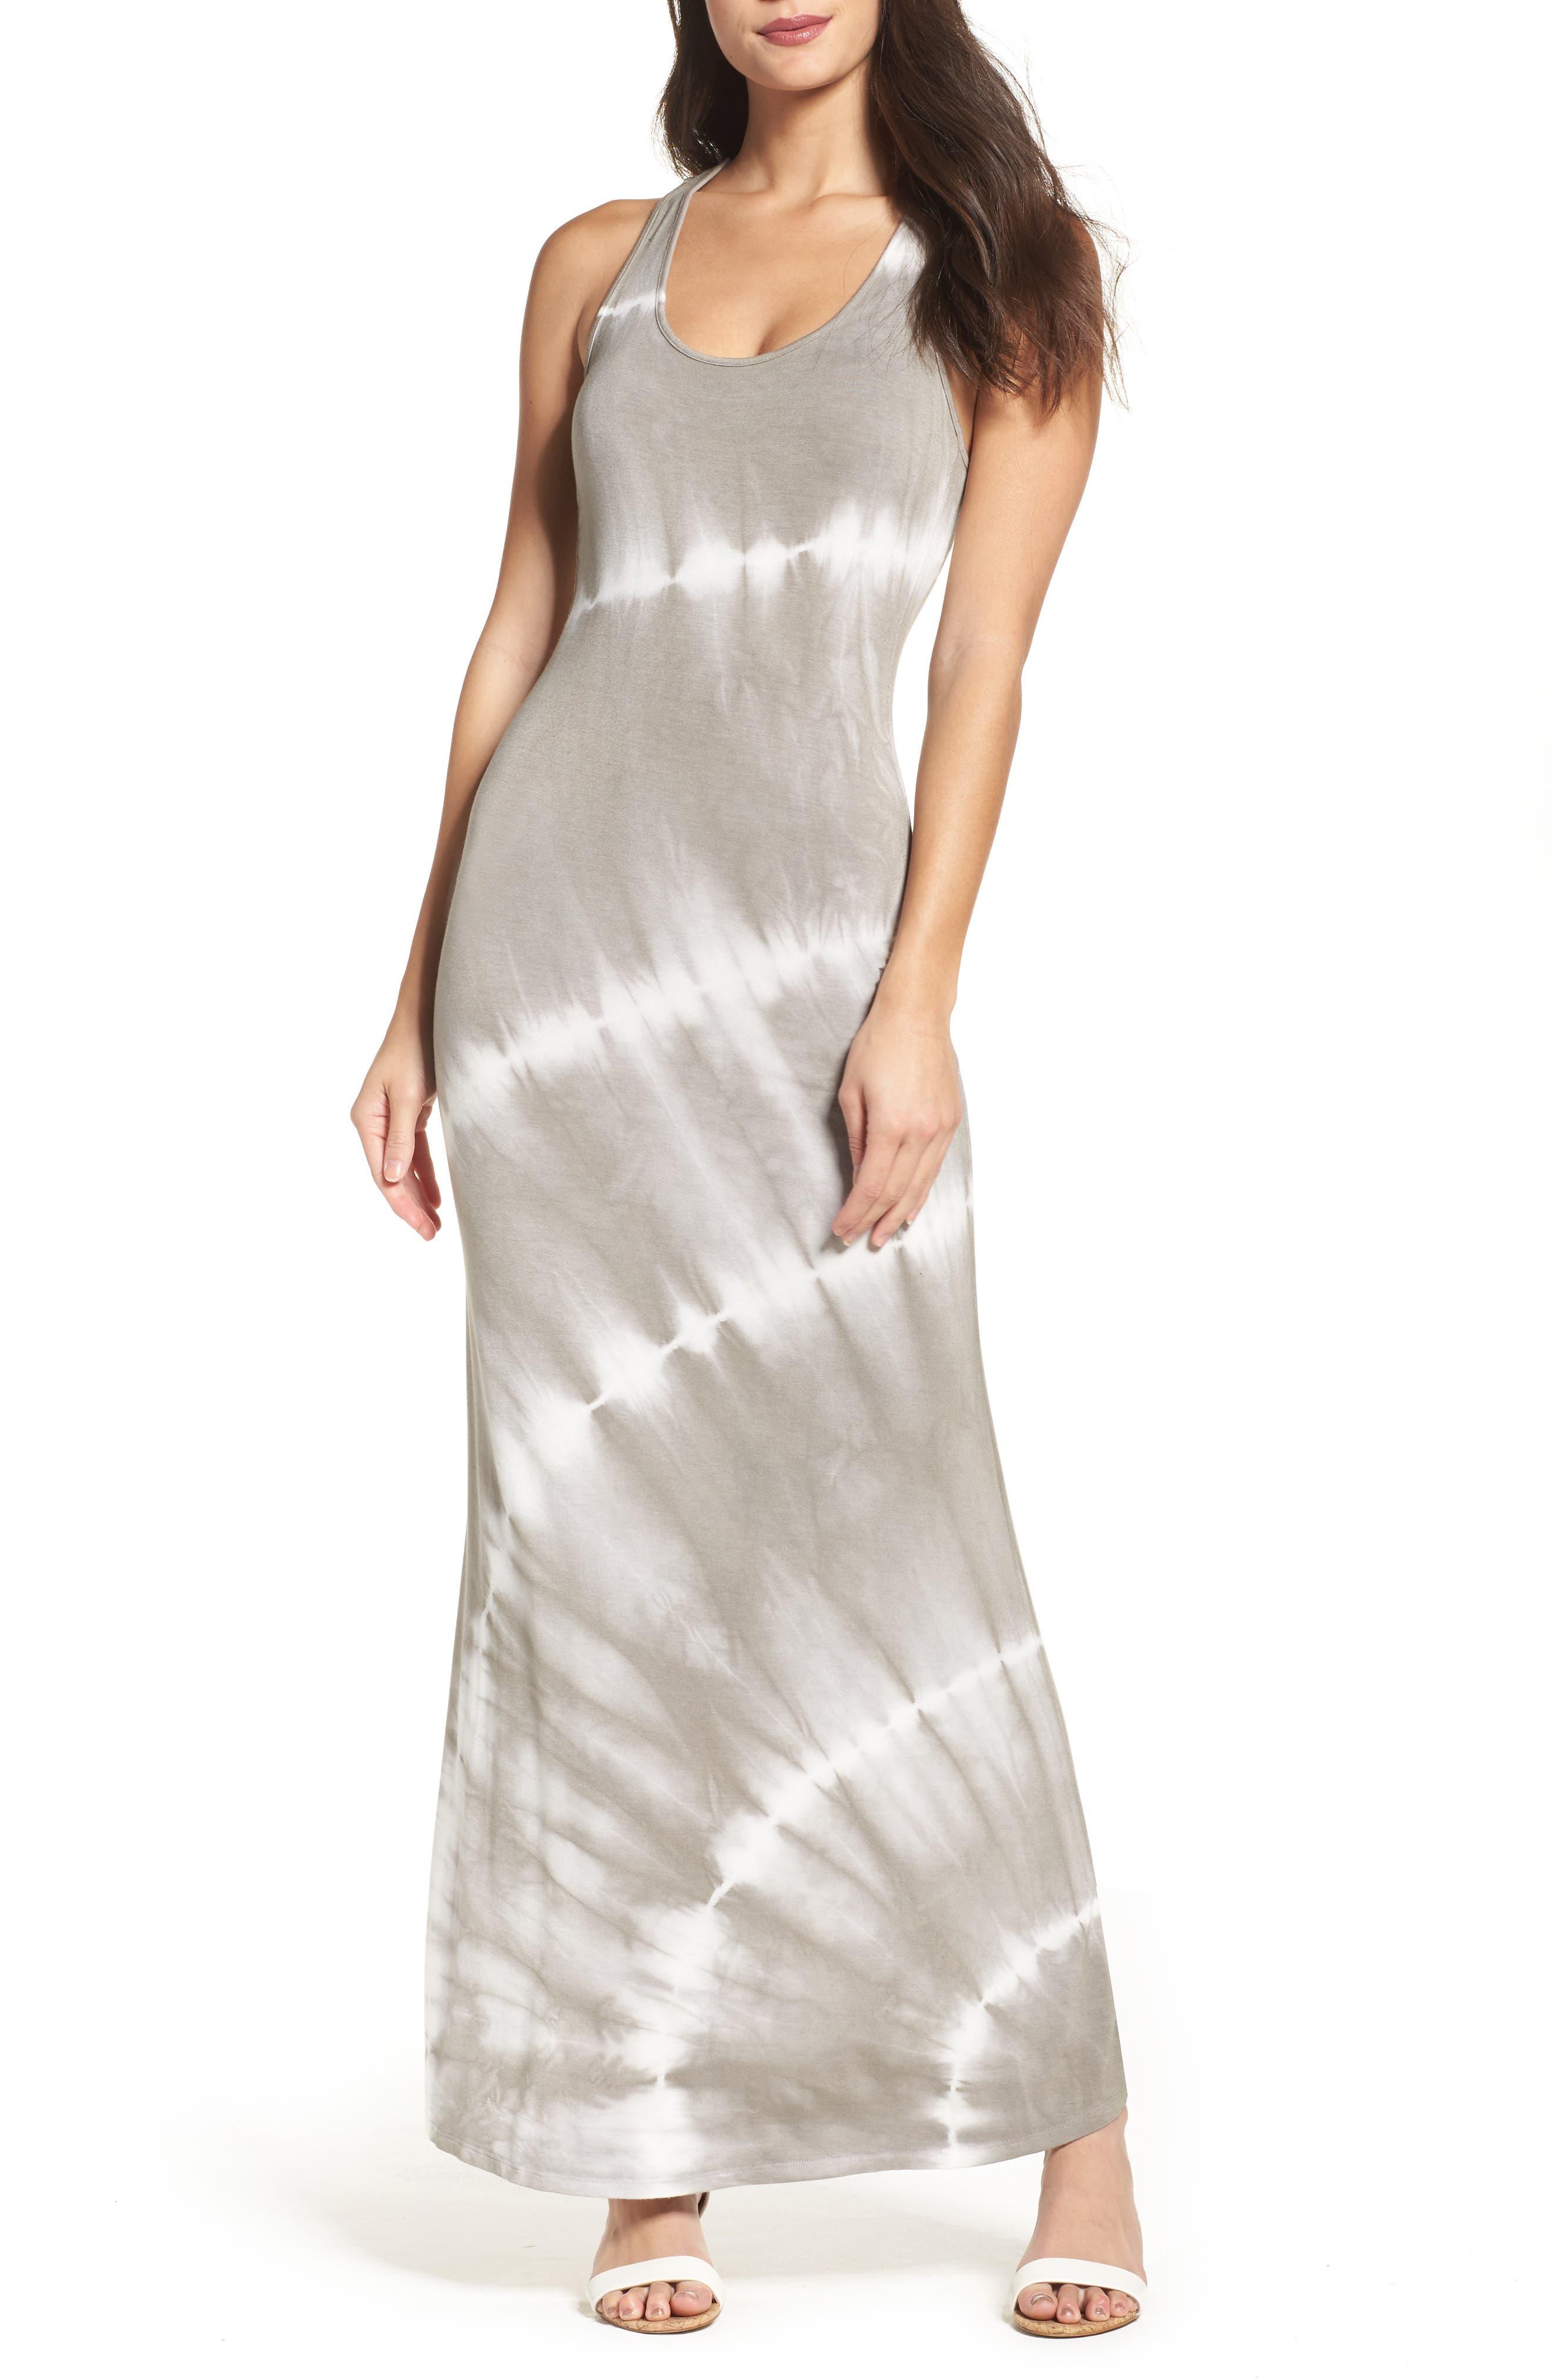 Tie Dye Racerback Maxi Dress,                         Main,                         color, Grey/ White